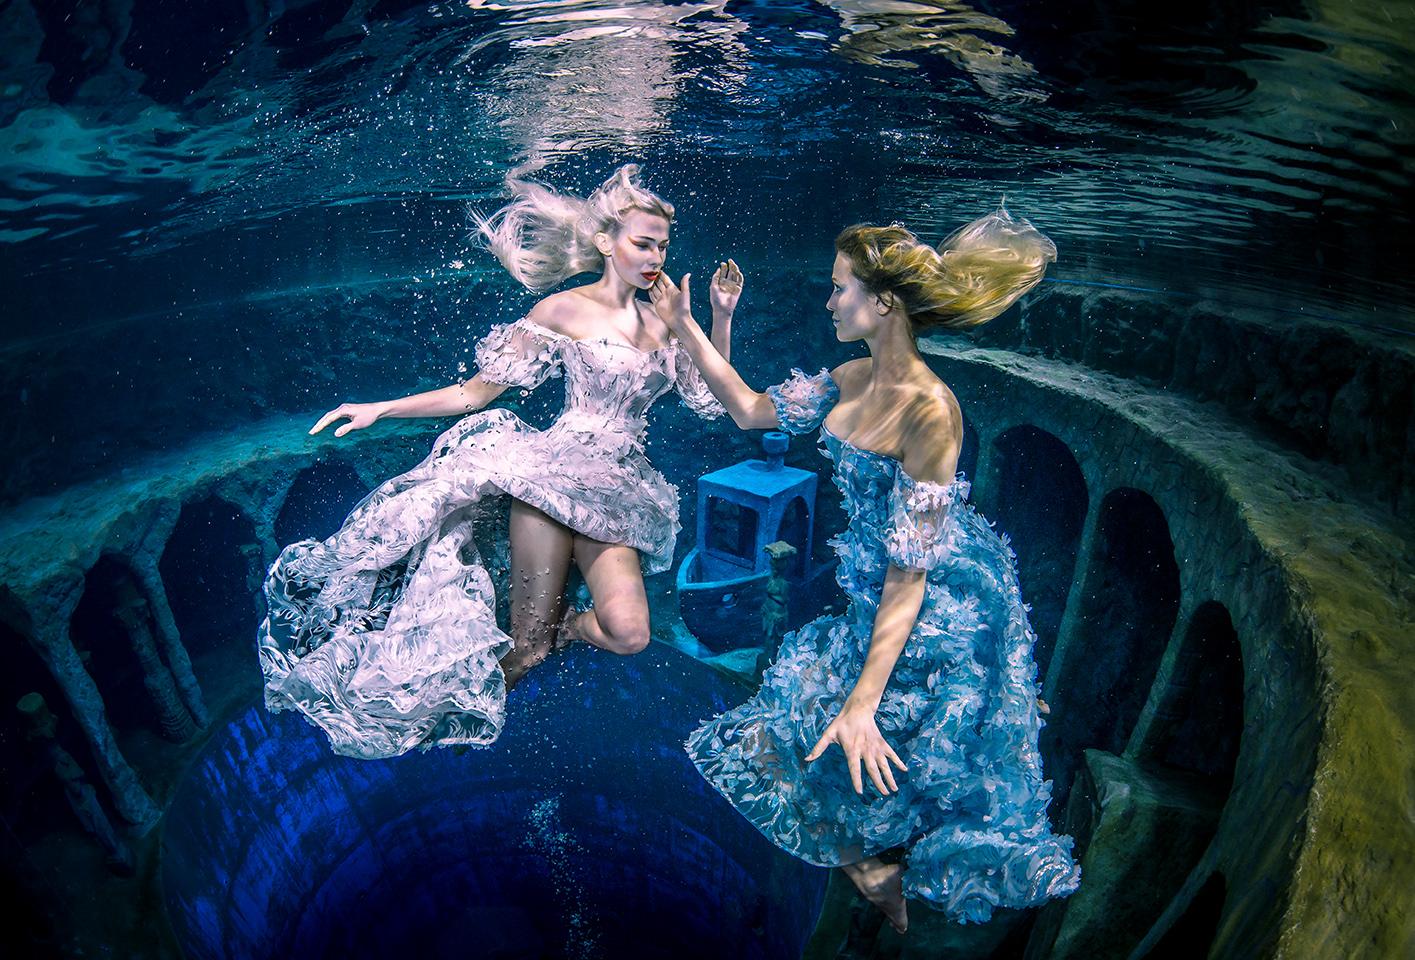 (C) Fotograf: Konstantin Killer, Model: Delia, Unterwasser Shooting